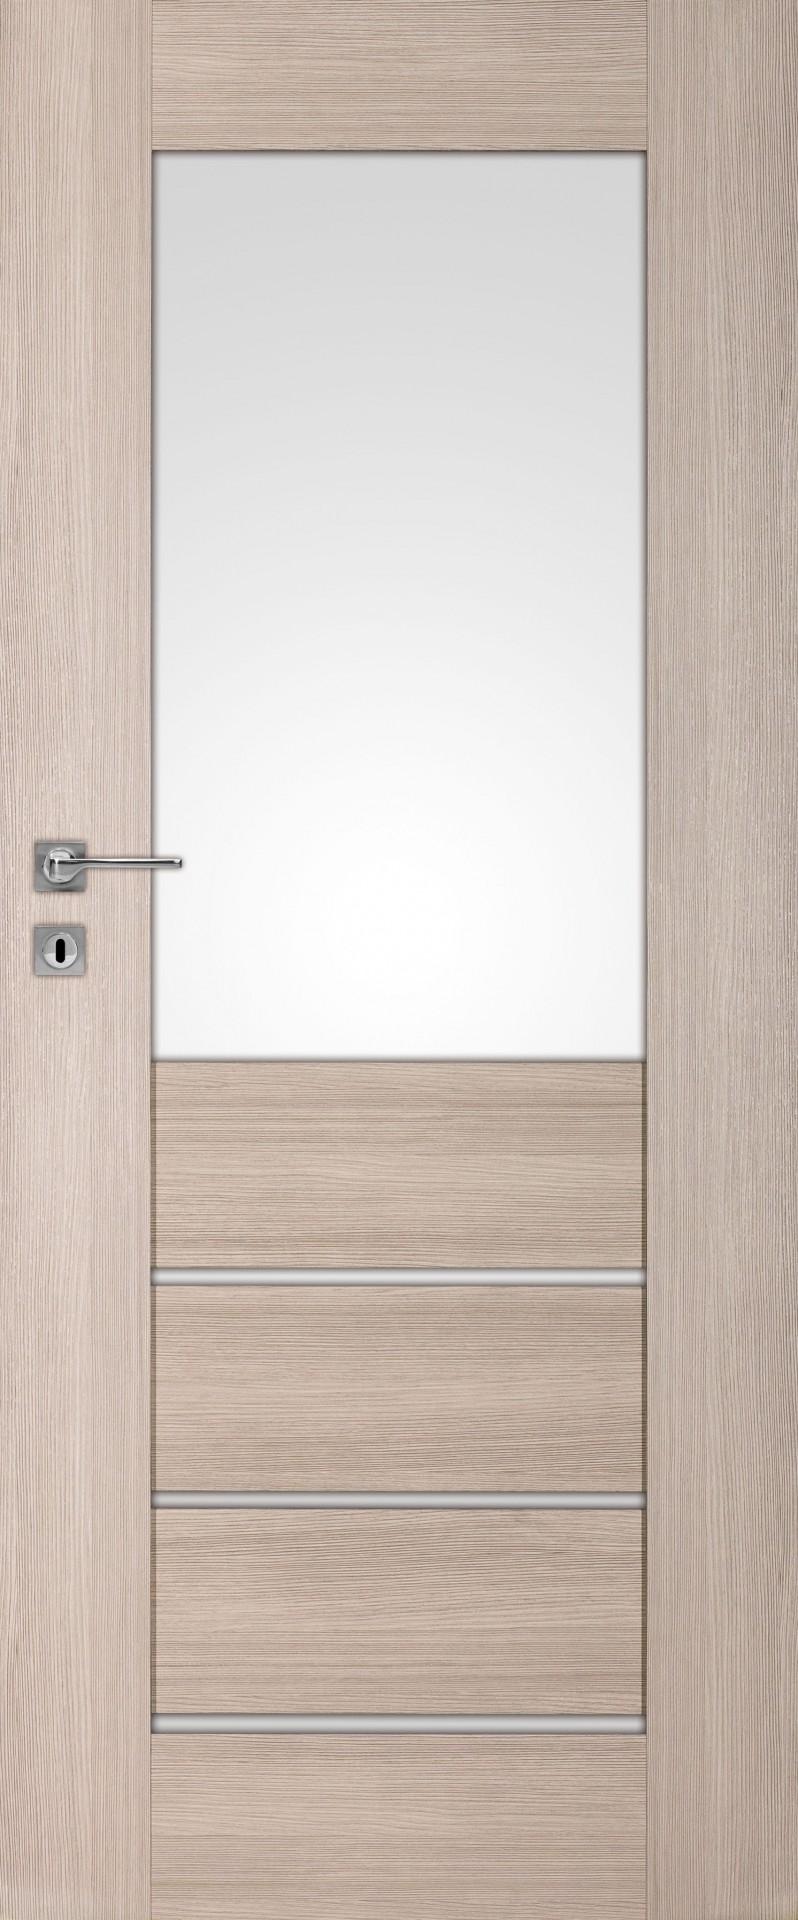 Dre dveře PREMIUM 2, Šíře v cm 60